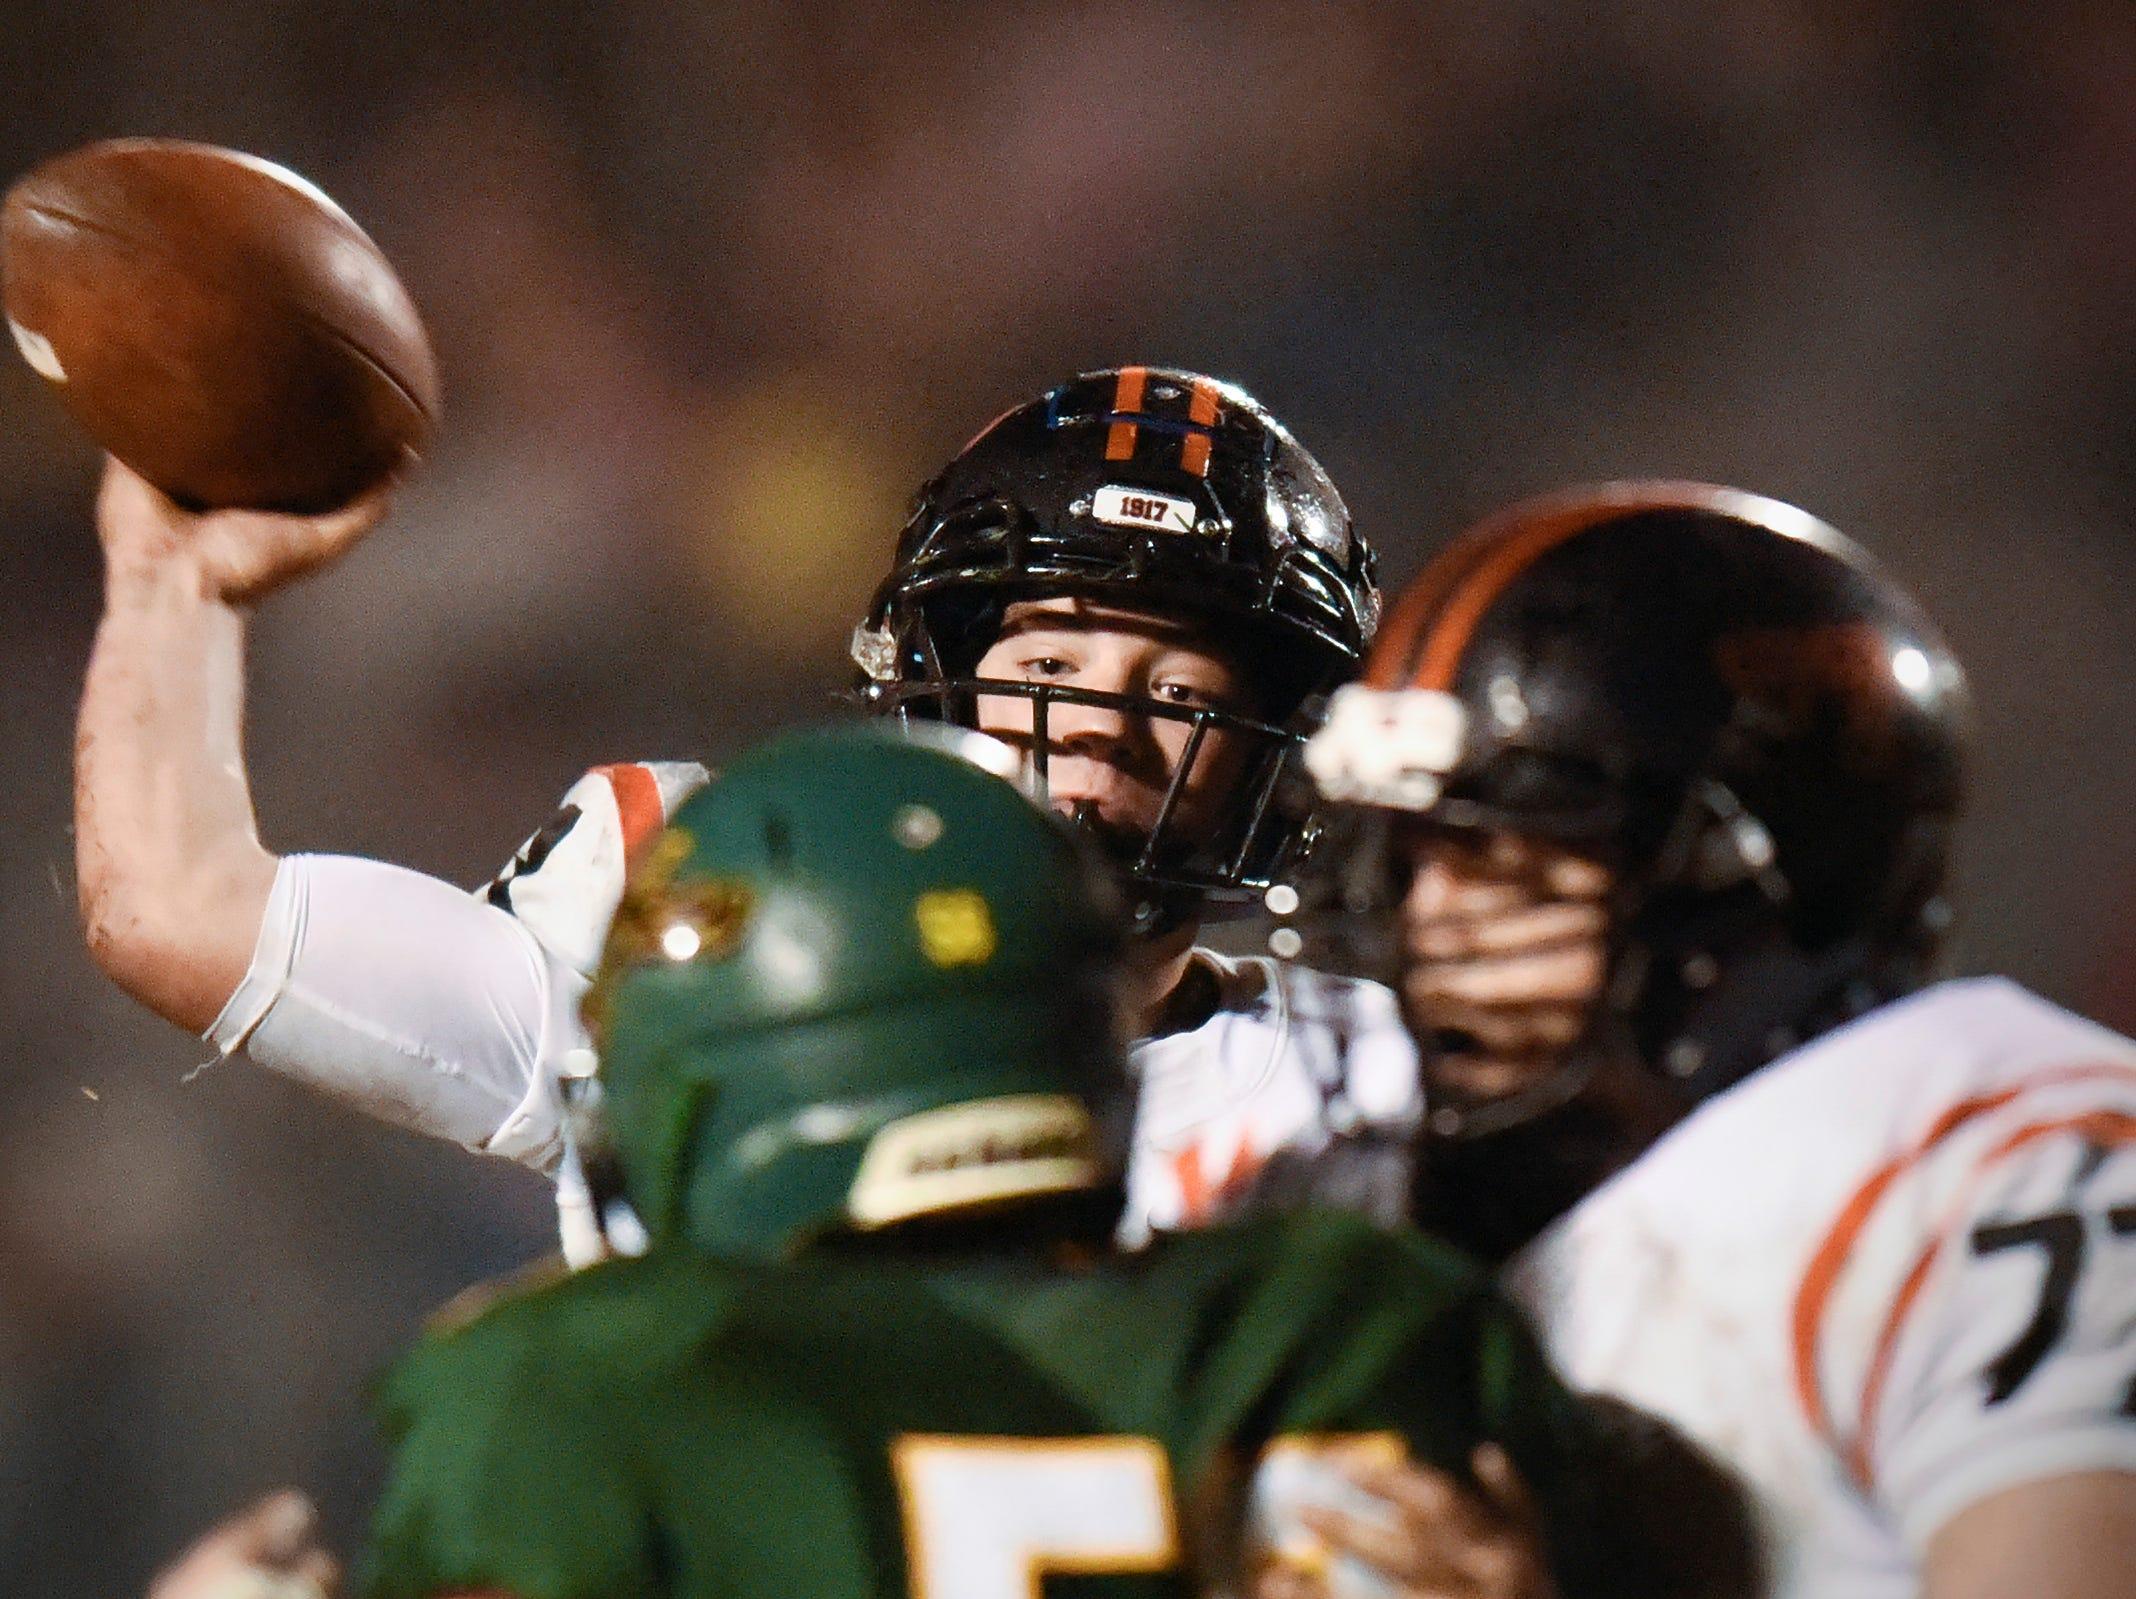 Tech quarterback Nate Trewick makes a pass against Sauk Rapids during the first half Friday, Oct. 5, in Sauk Rapids.